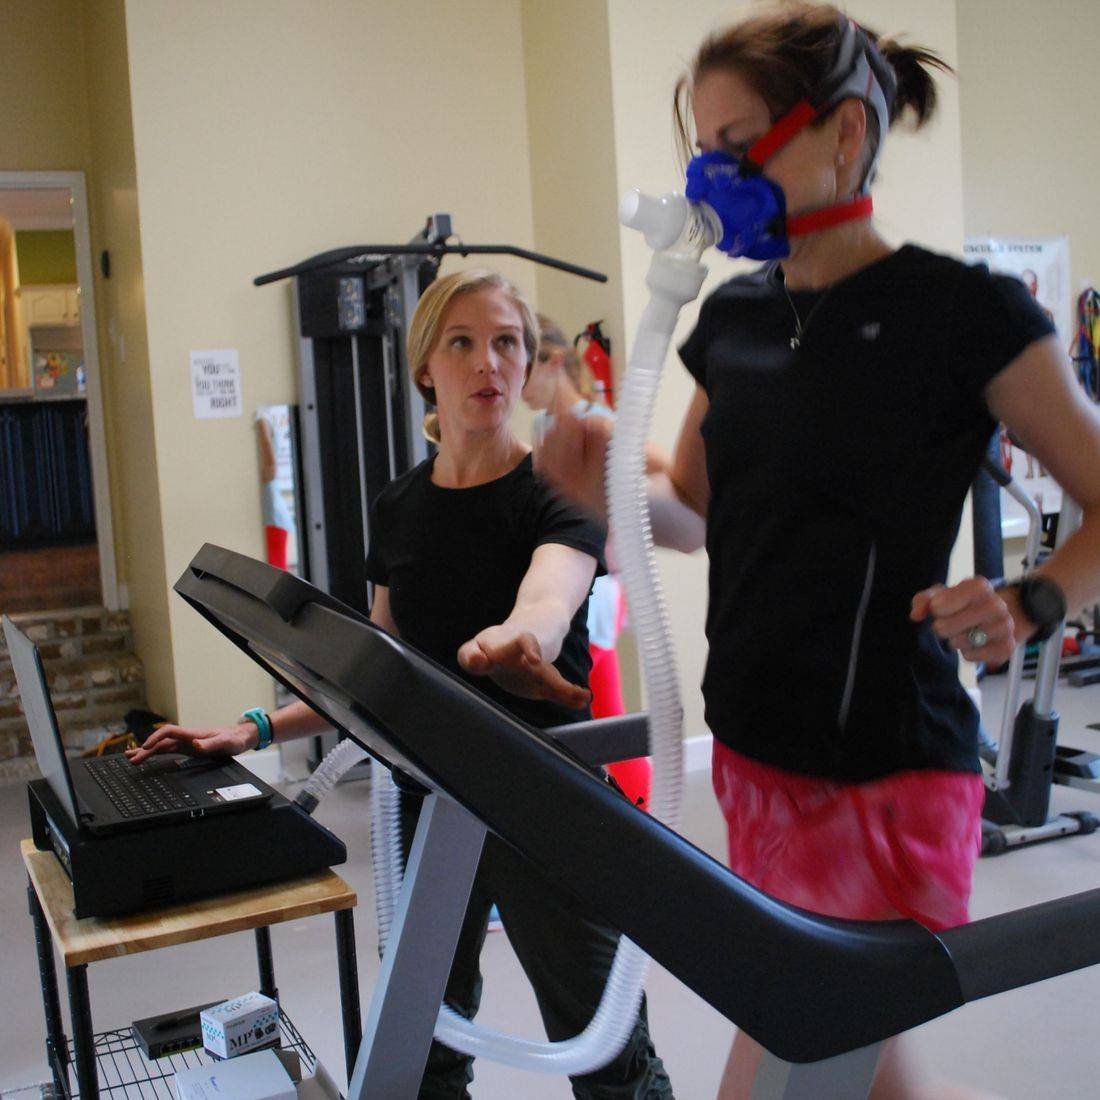 personal trainer savannah ga, personal training savannah ga, heart rate training for running, vo2max savannah ga, running savannah ga, running test savannah ga